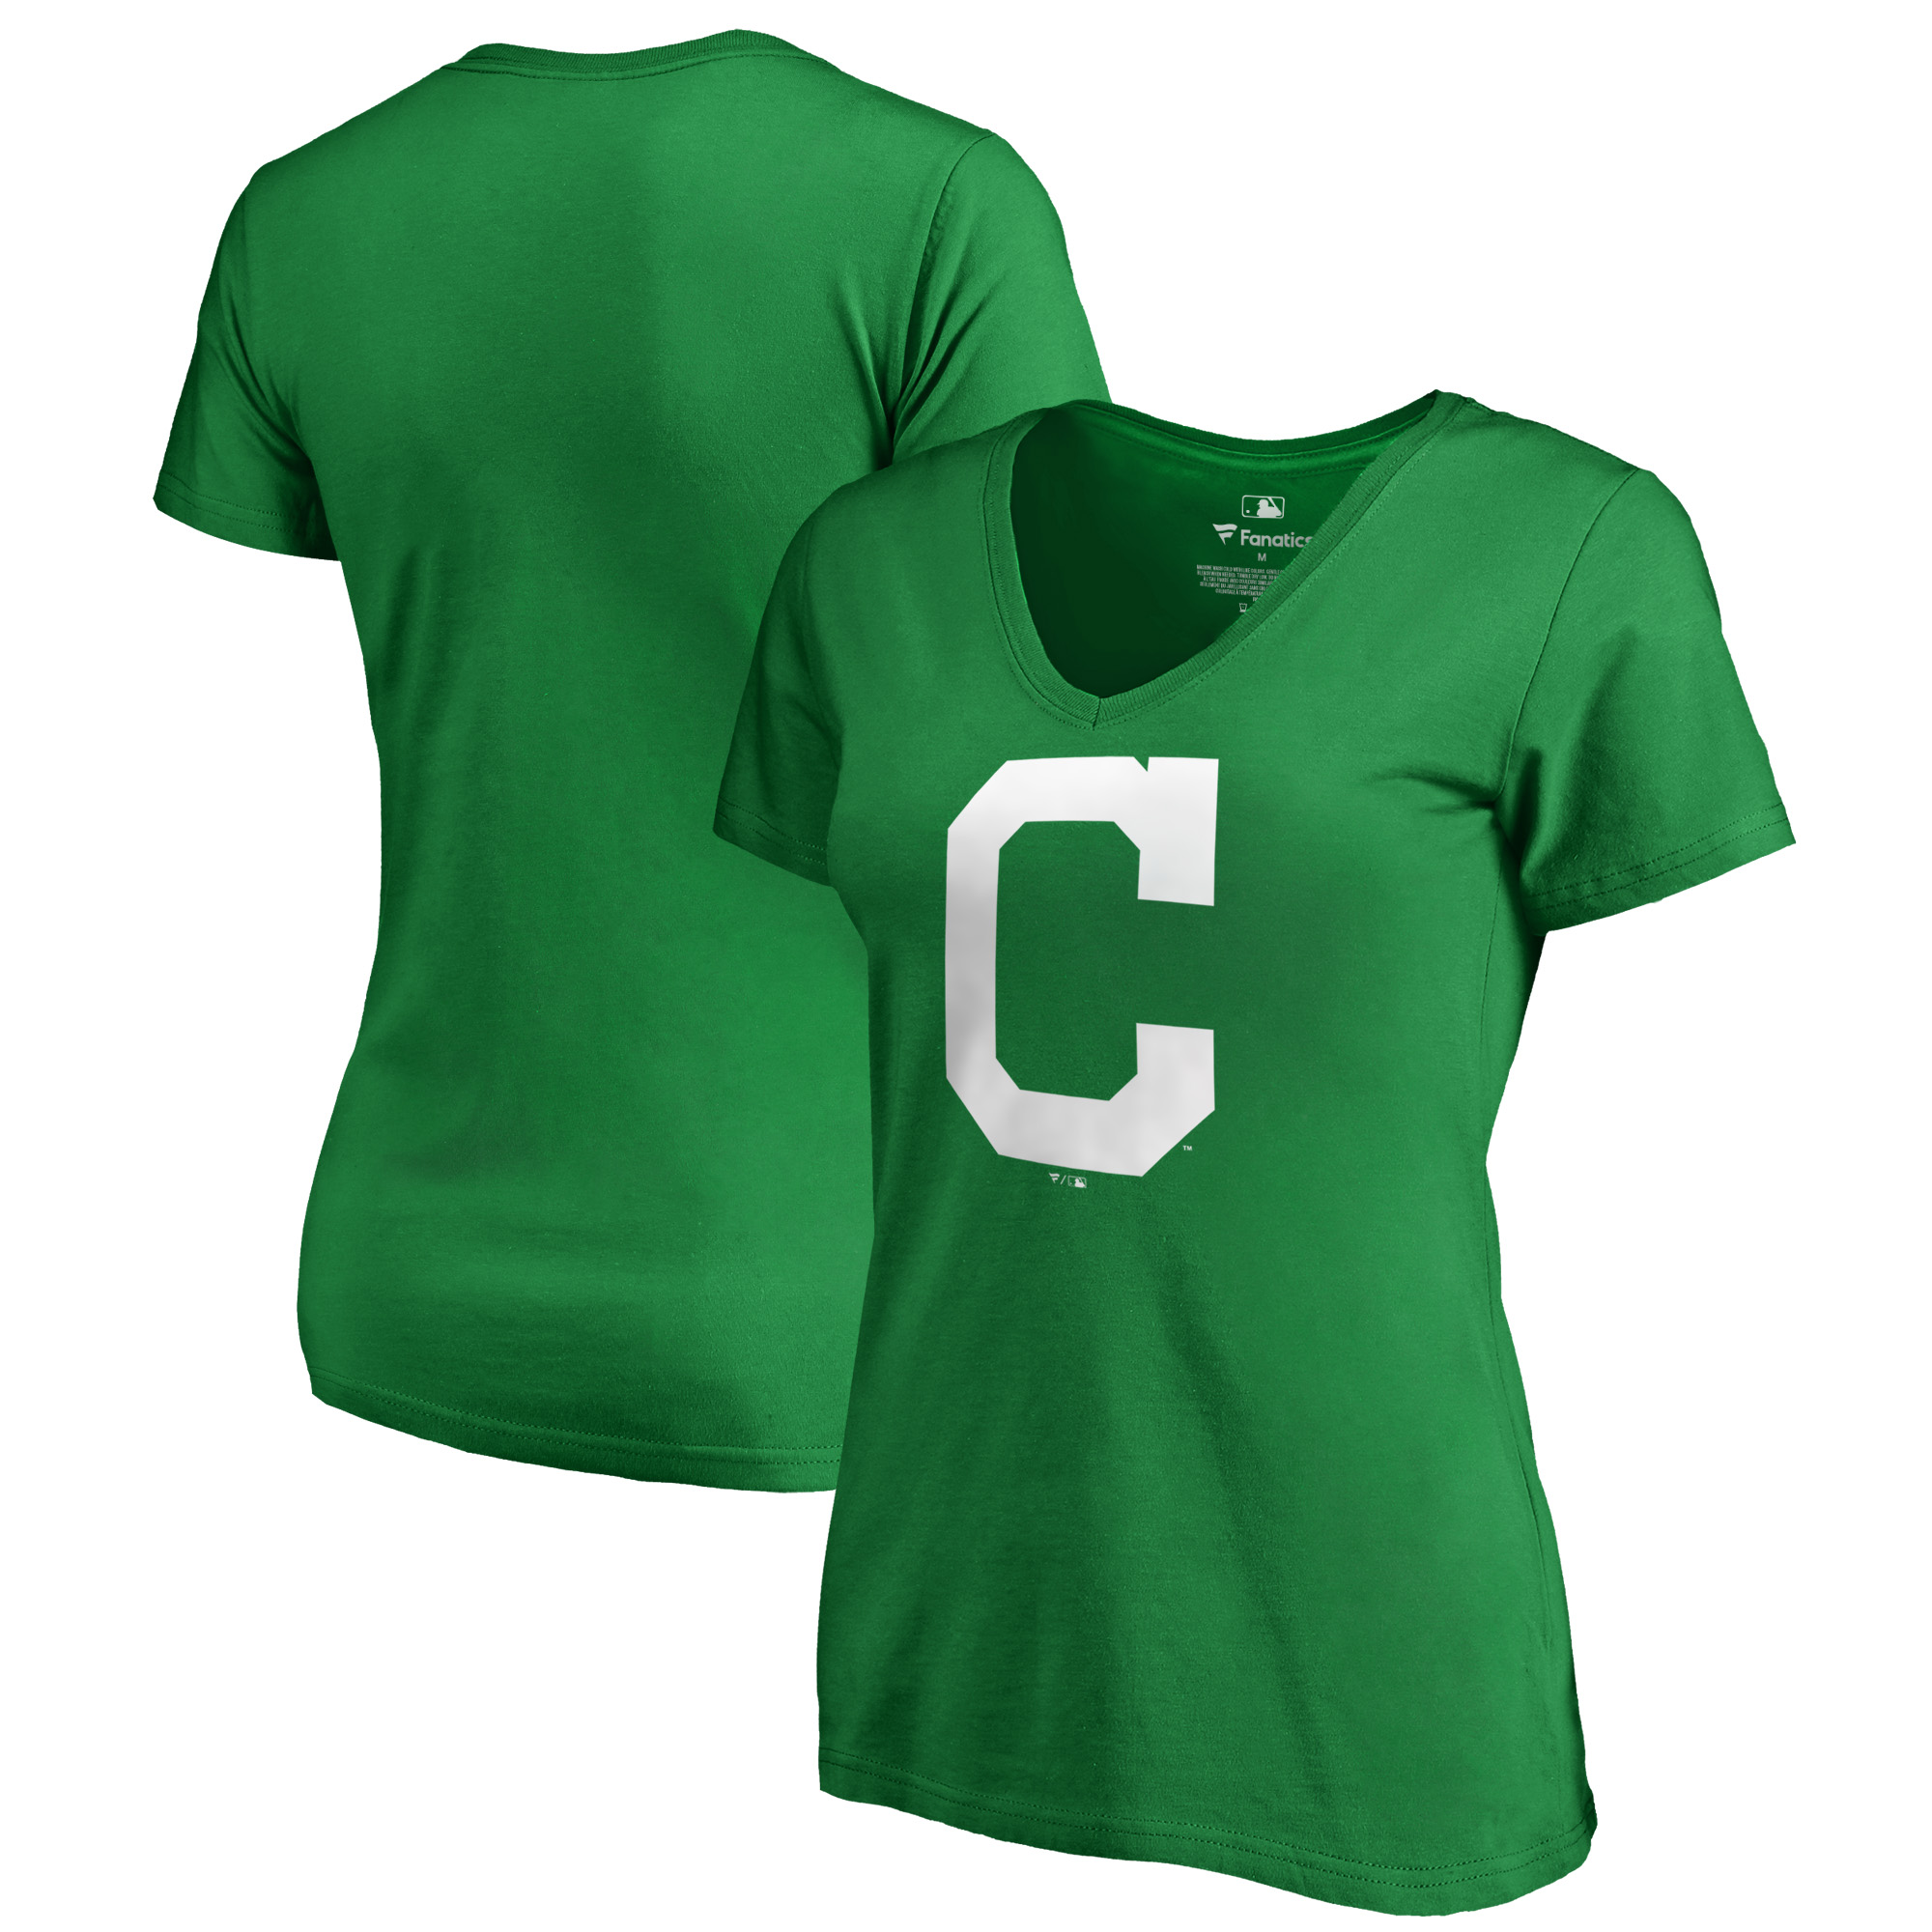 Cleveland Indians Fanatics Branded Women's St. Patrick's Day White Logo Plus Size V-Neck T-Shirt - Kelly Green